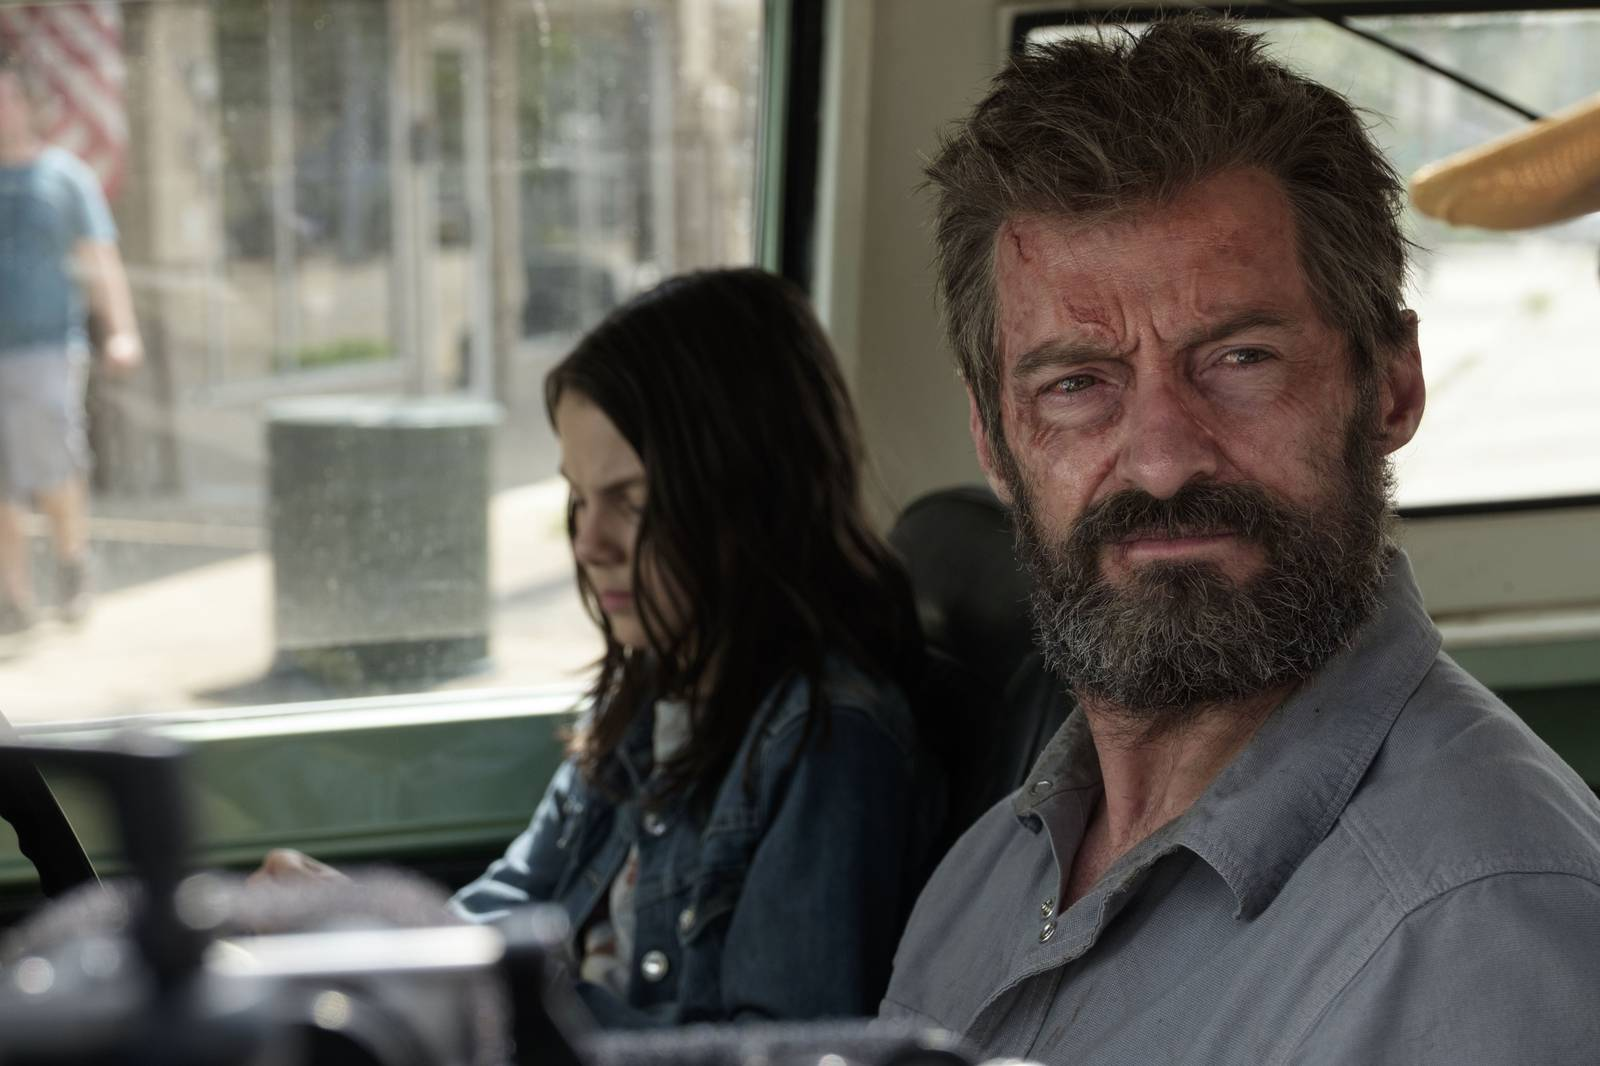 Fotogaléria Logan: Wolverine (2017)